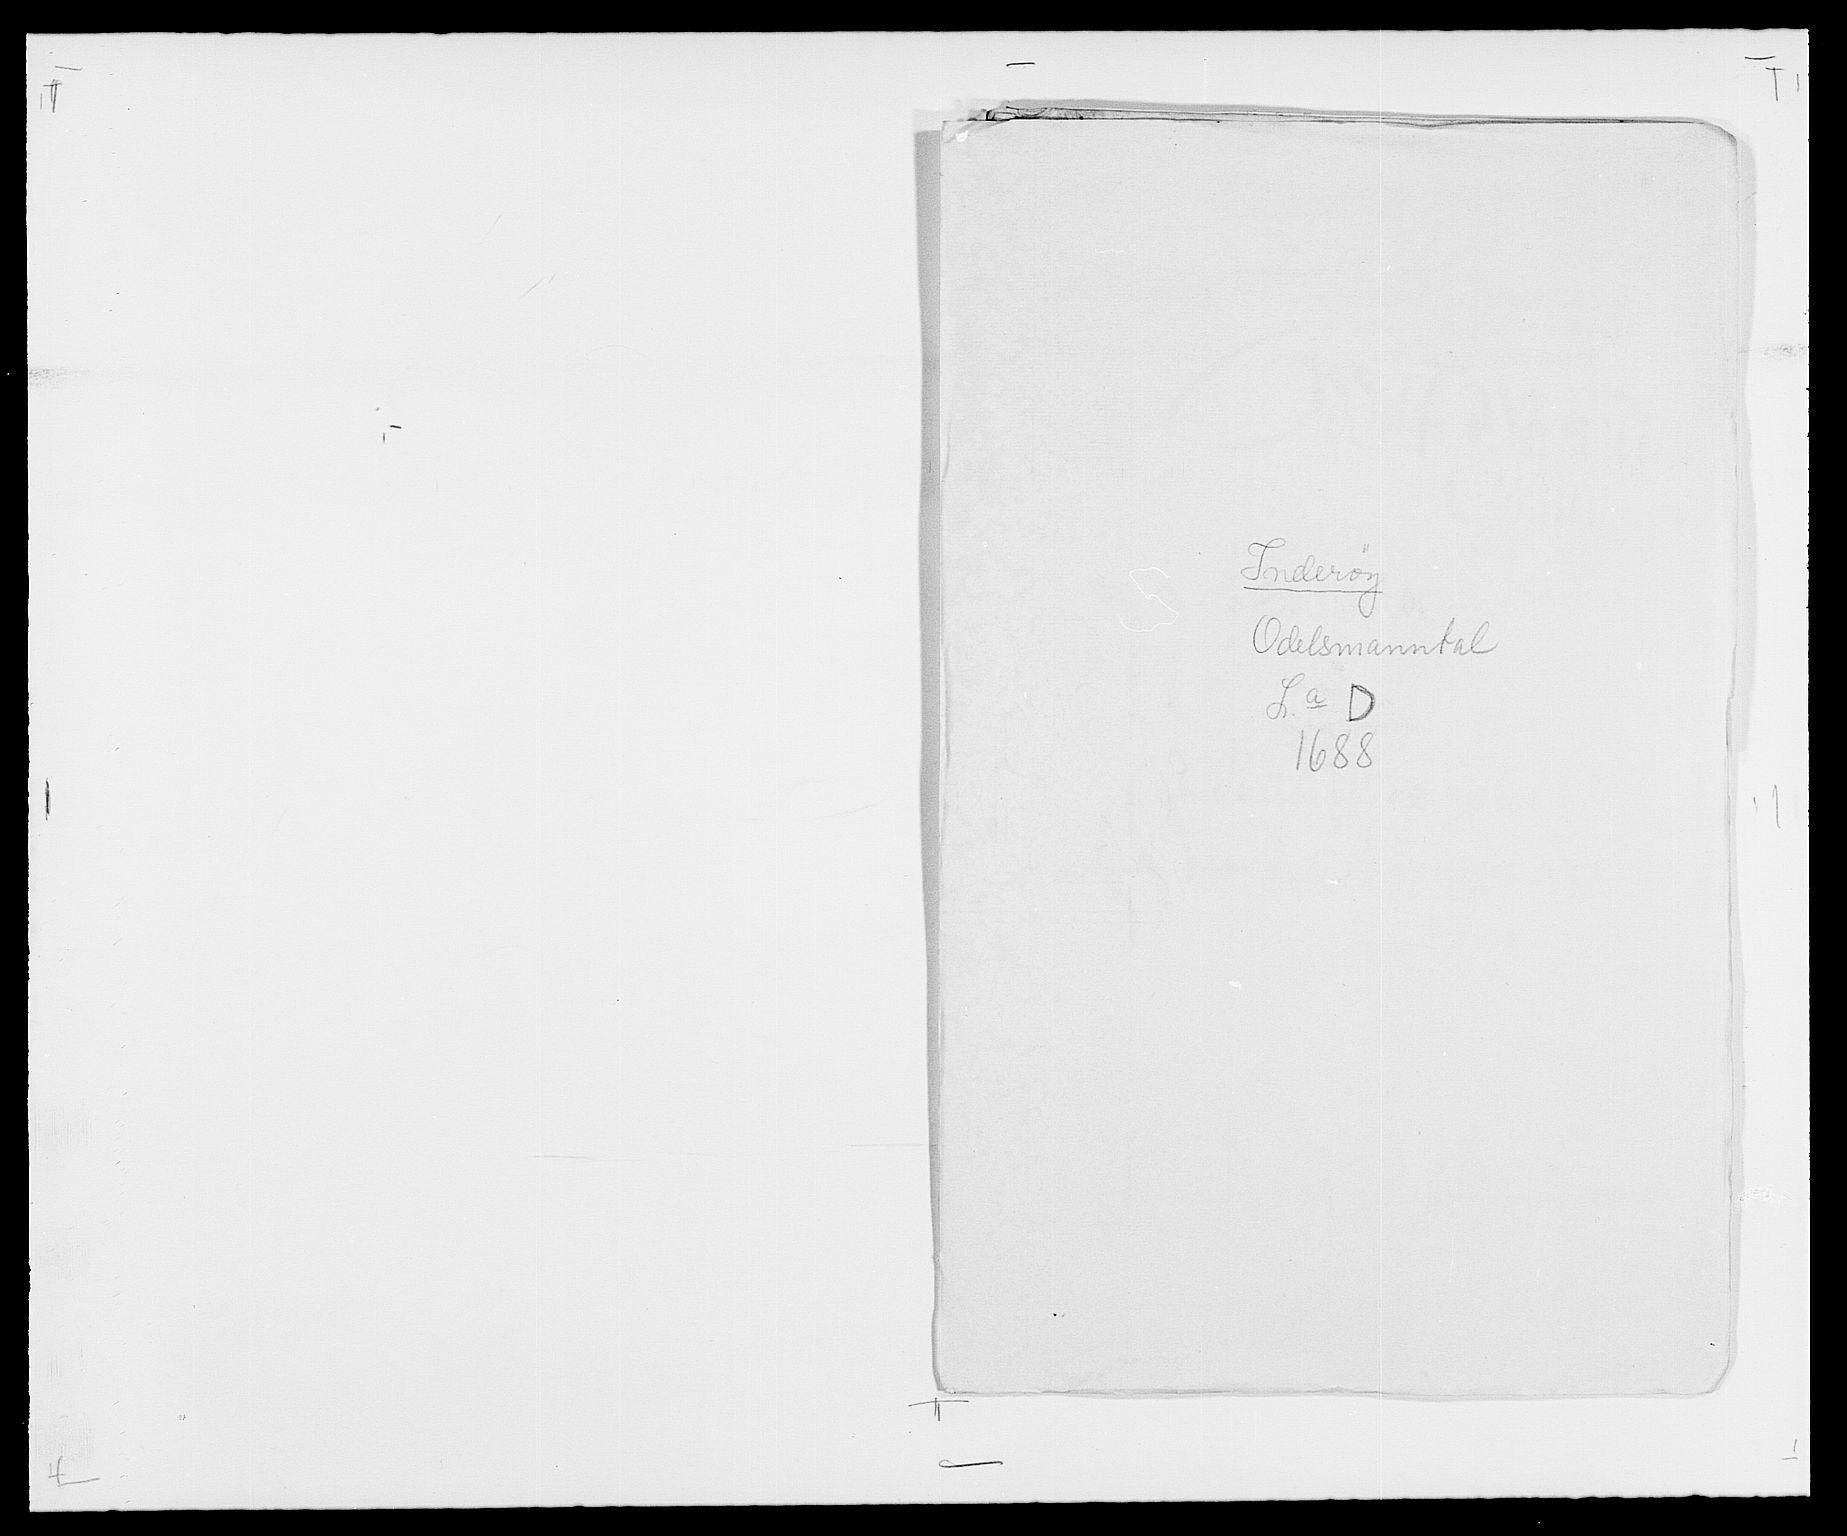 RA, Rentekammeret inntil 1814, Reviderte regnskaper, Fogderegnskap, R63/L4306: Fogderegnskap Inderøy, 1687-1689, s. 254